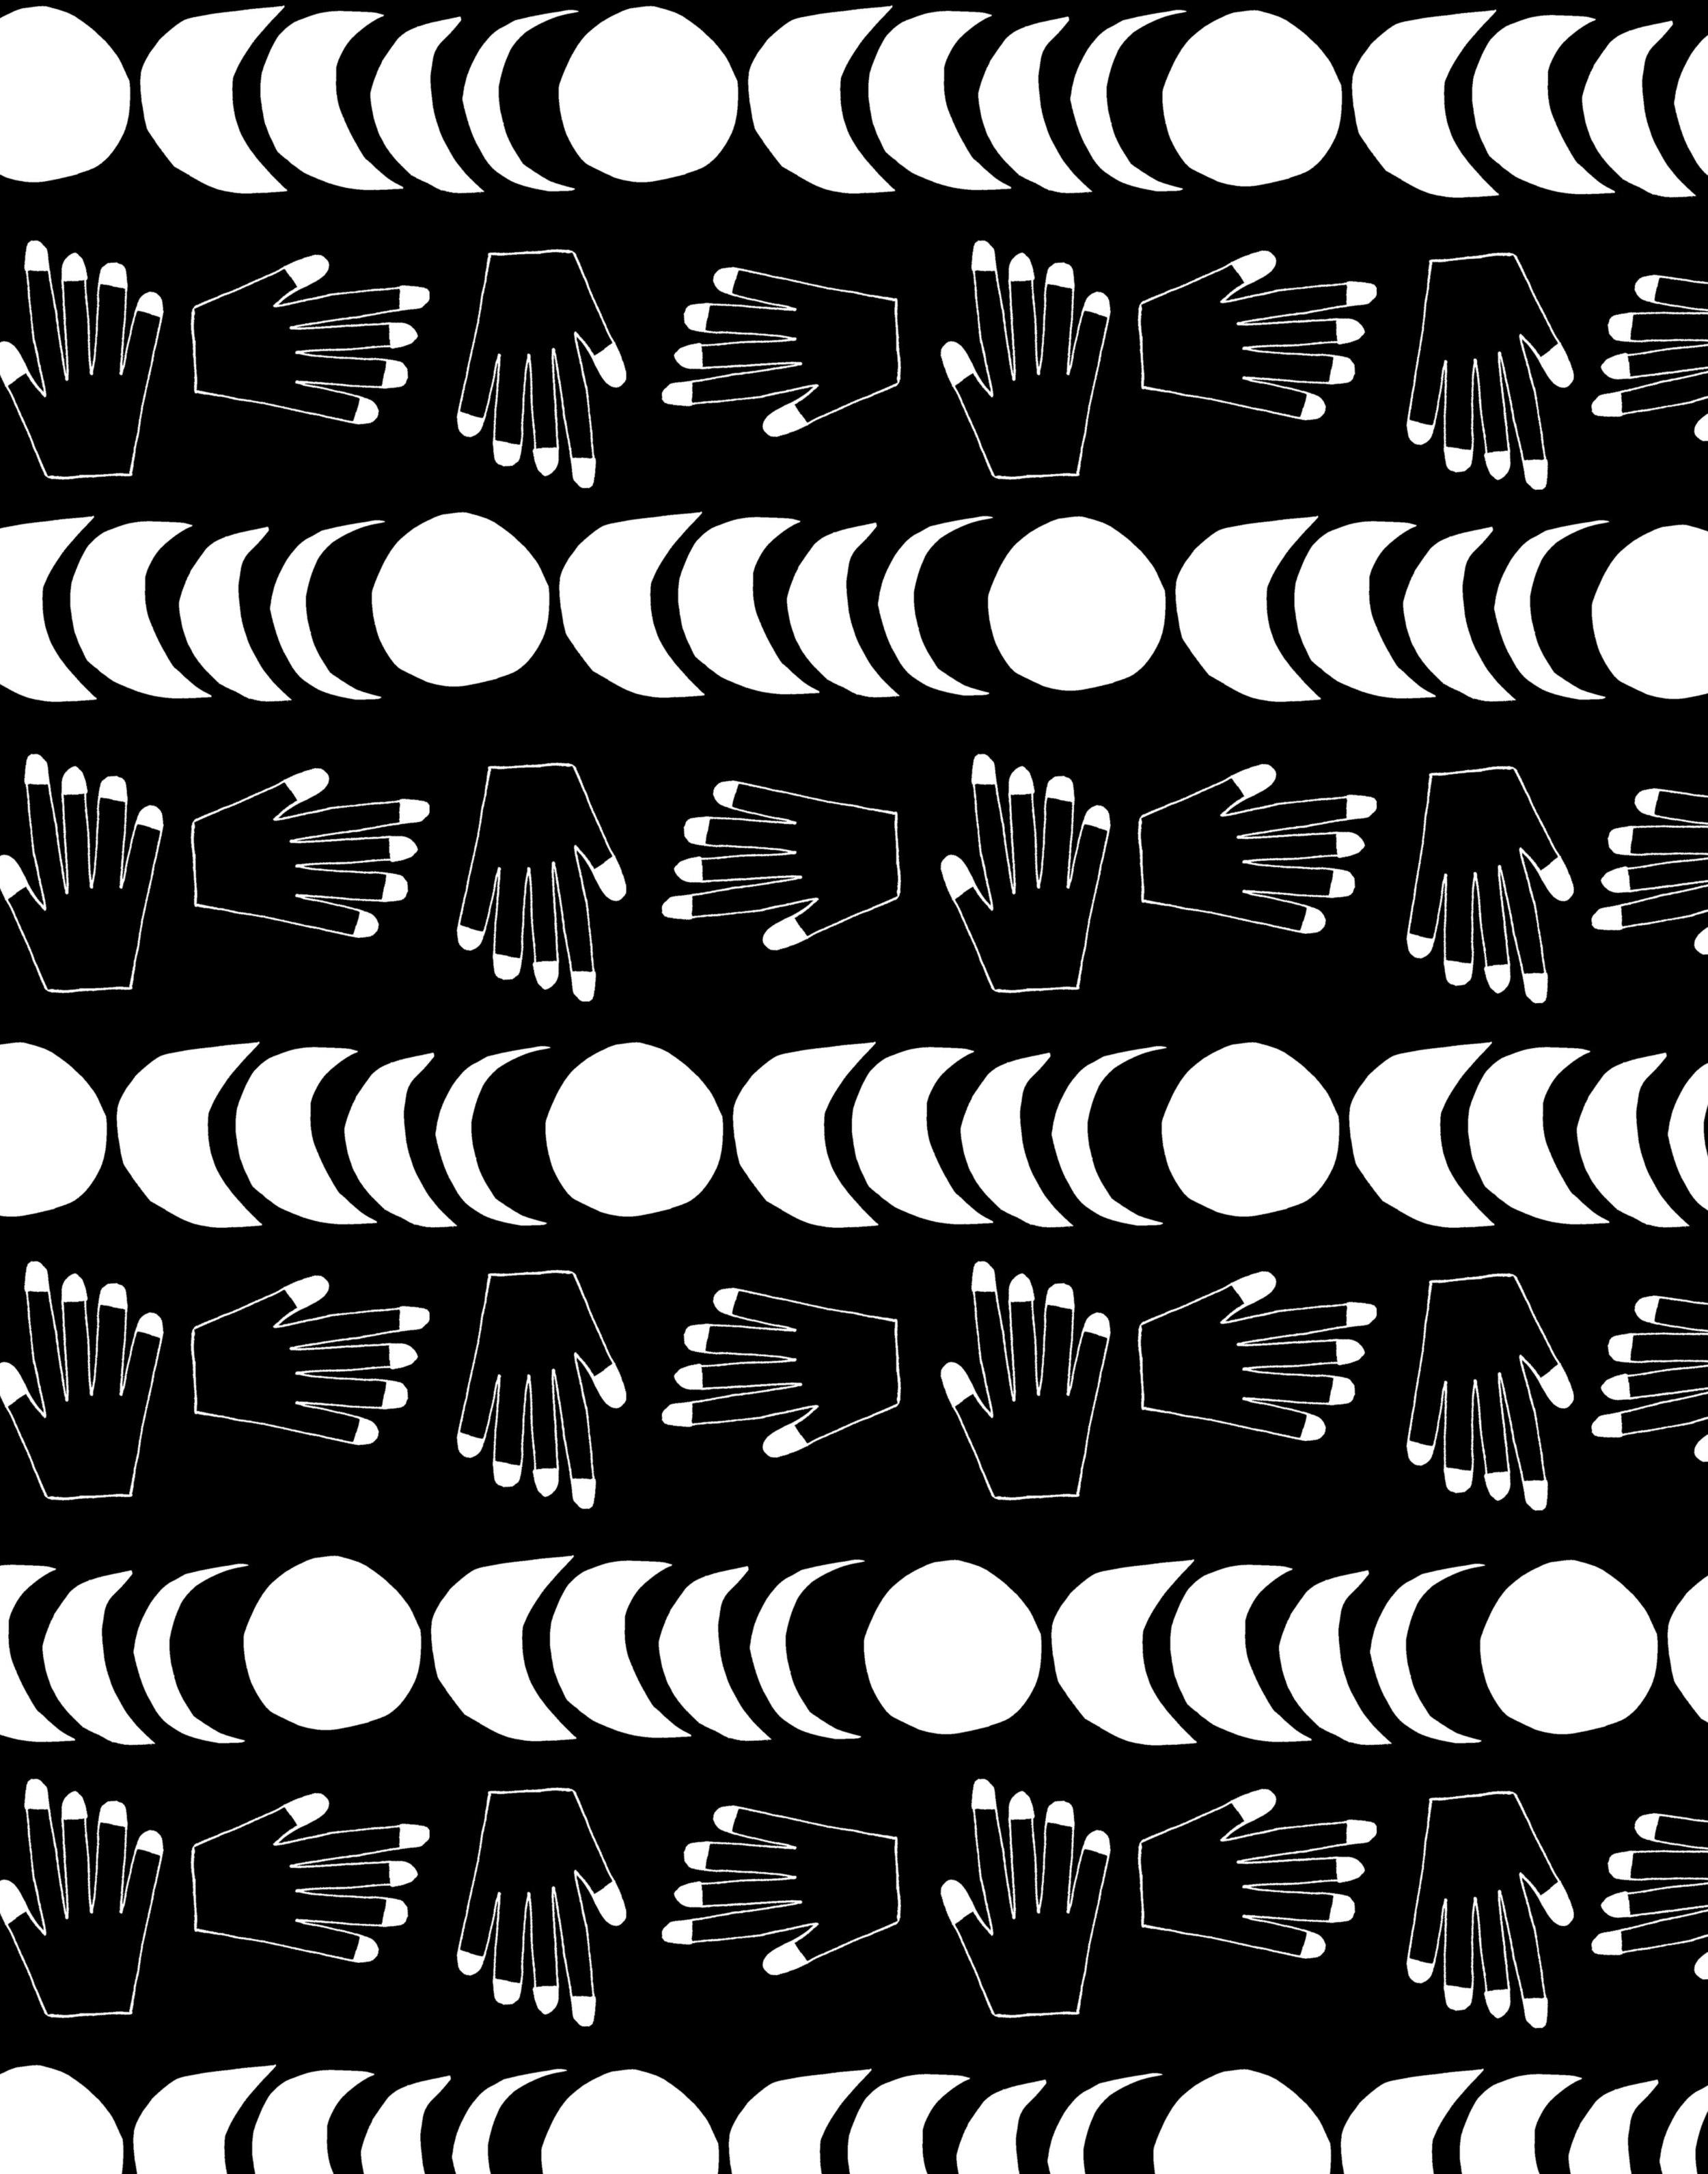 Moons & Hands black.jpg